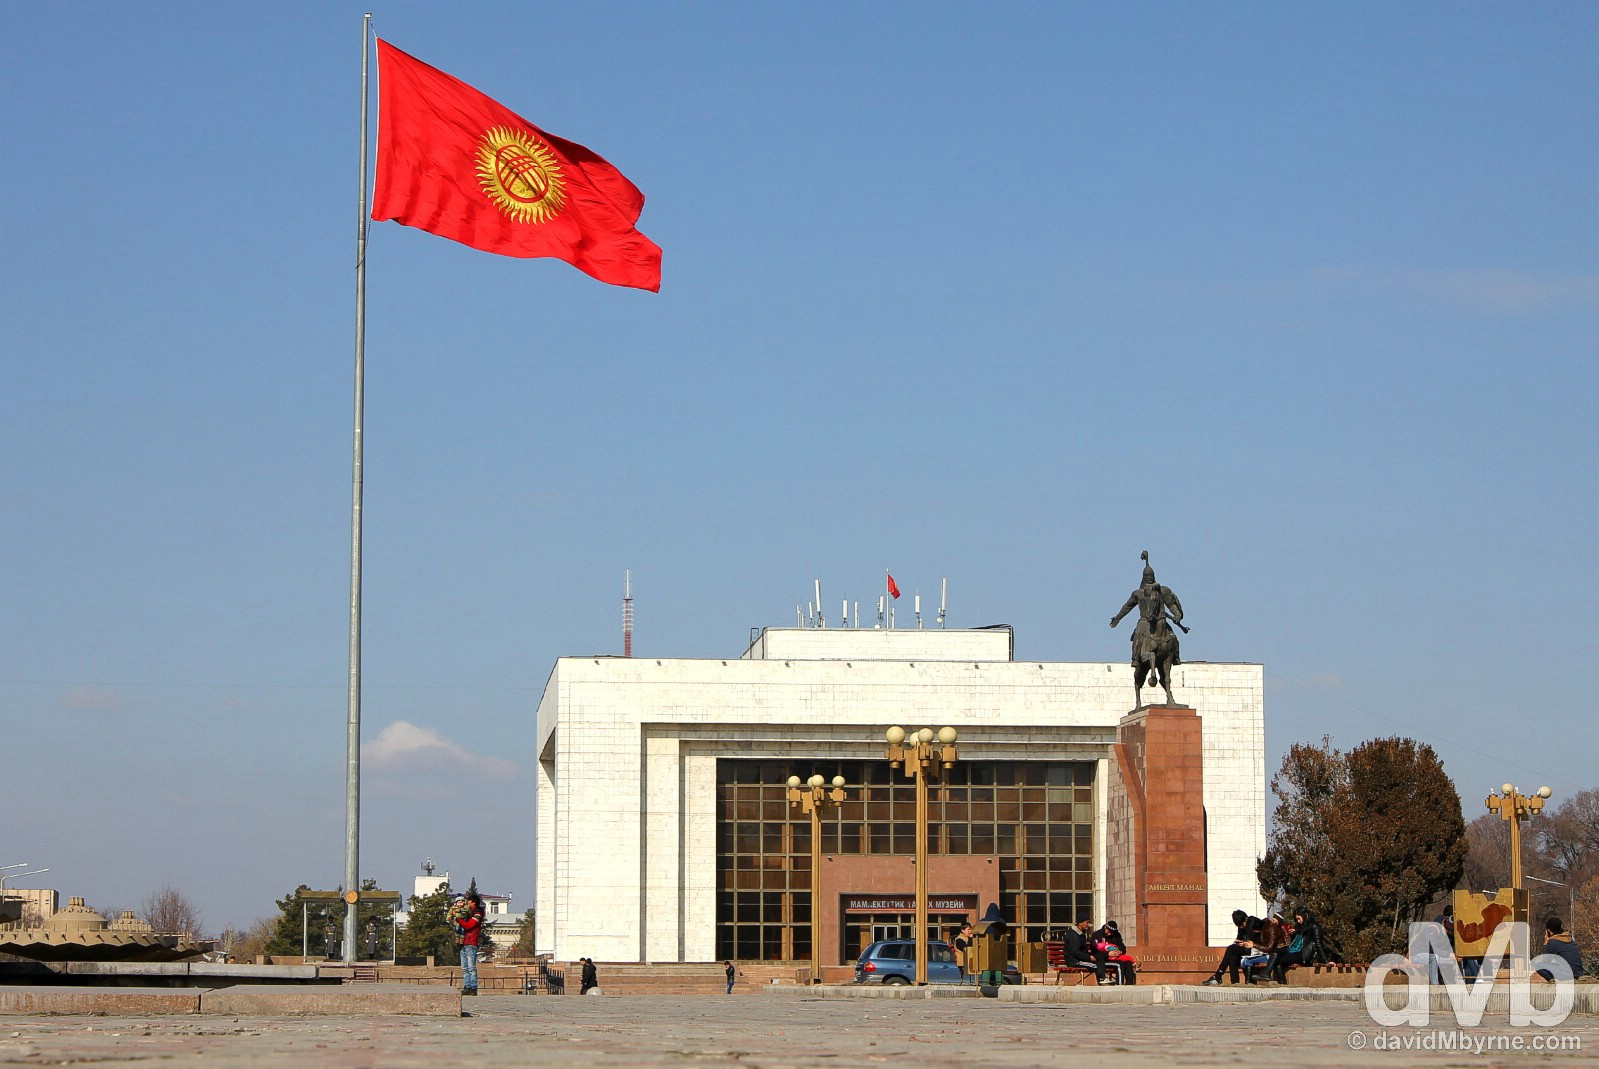 Ala-Too Square, central Bishkek, Kyrgyzstan. February 27, 2015.